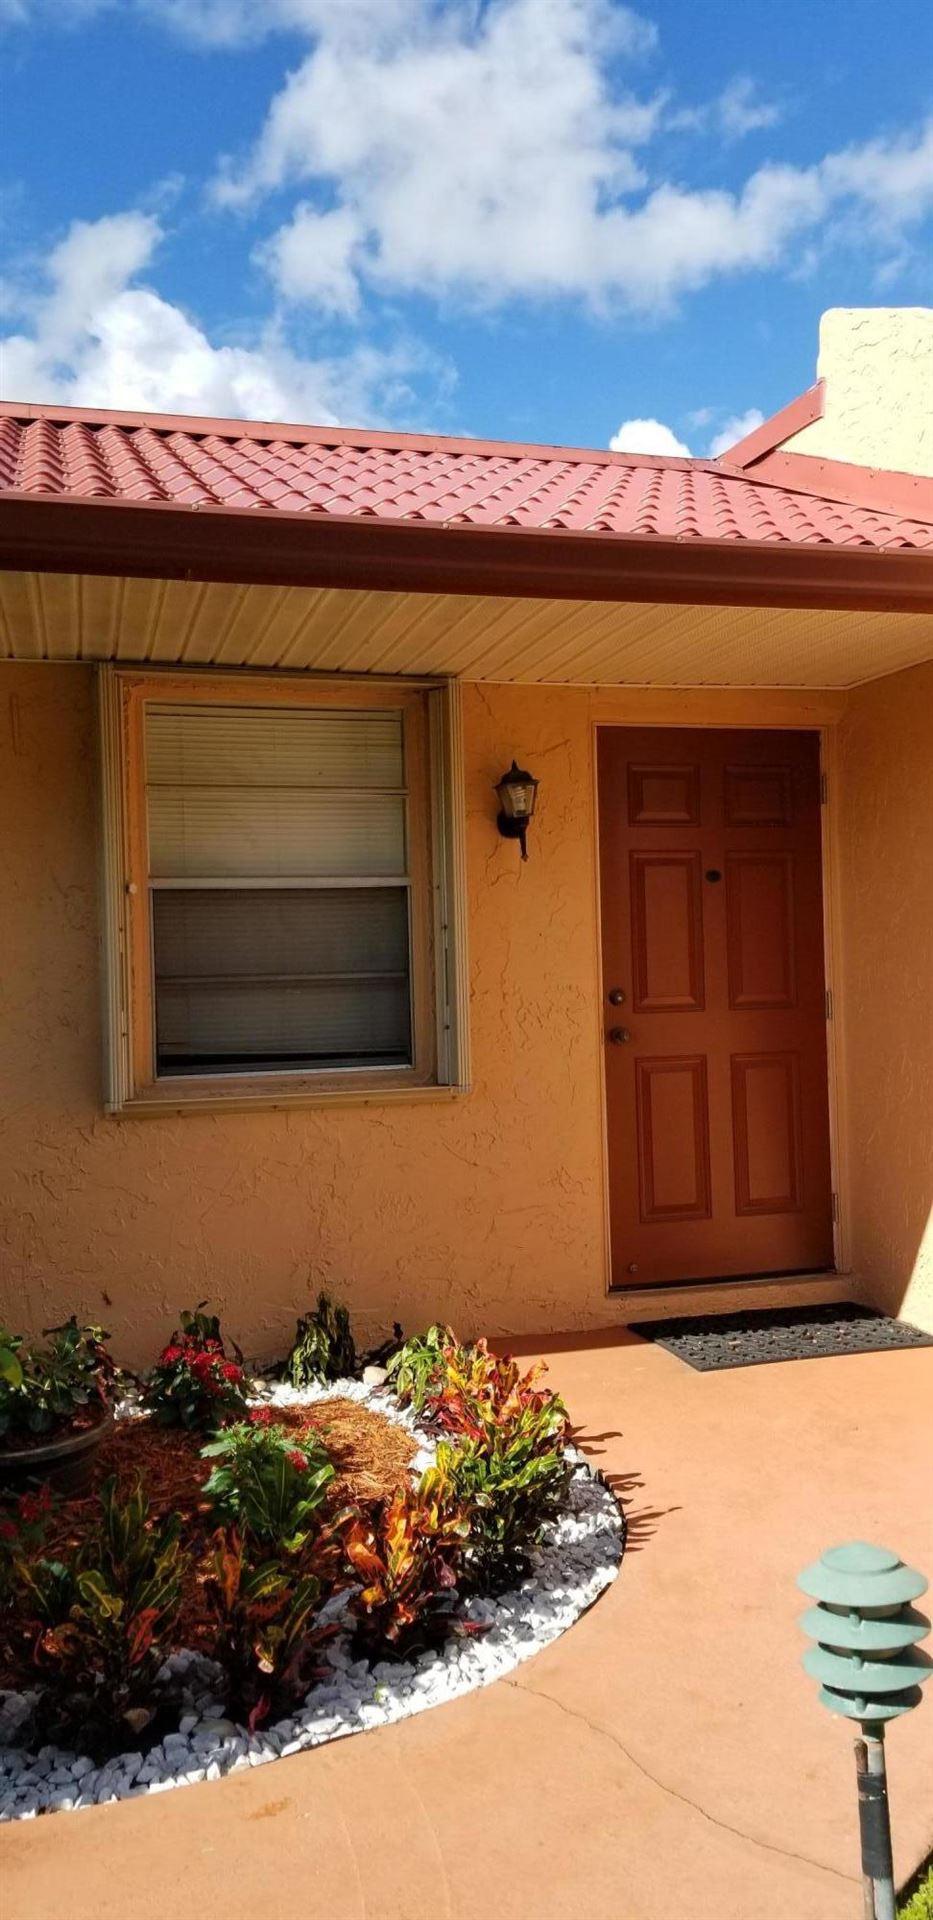 407 Lake Helen Drive, West Palm Beach, FL 33411 - #: RX-10664342